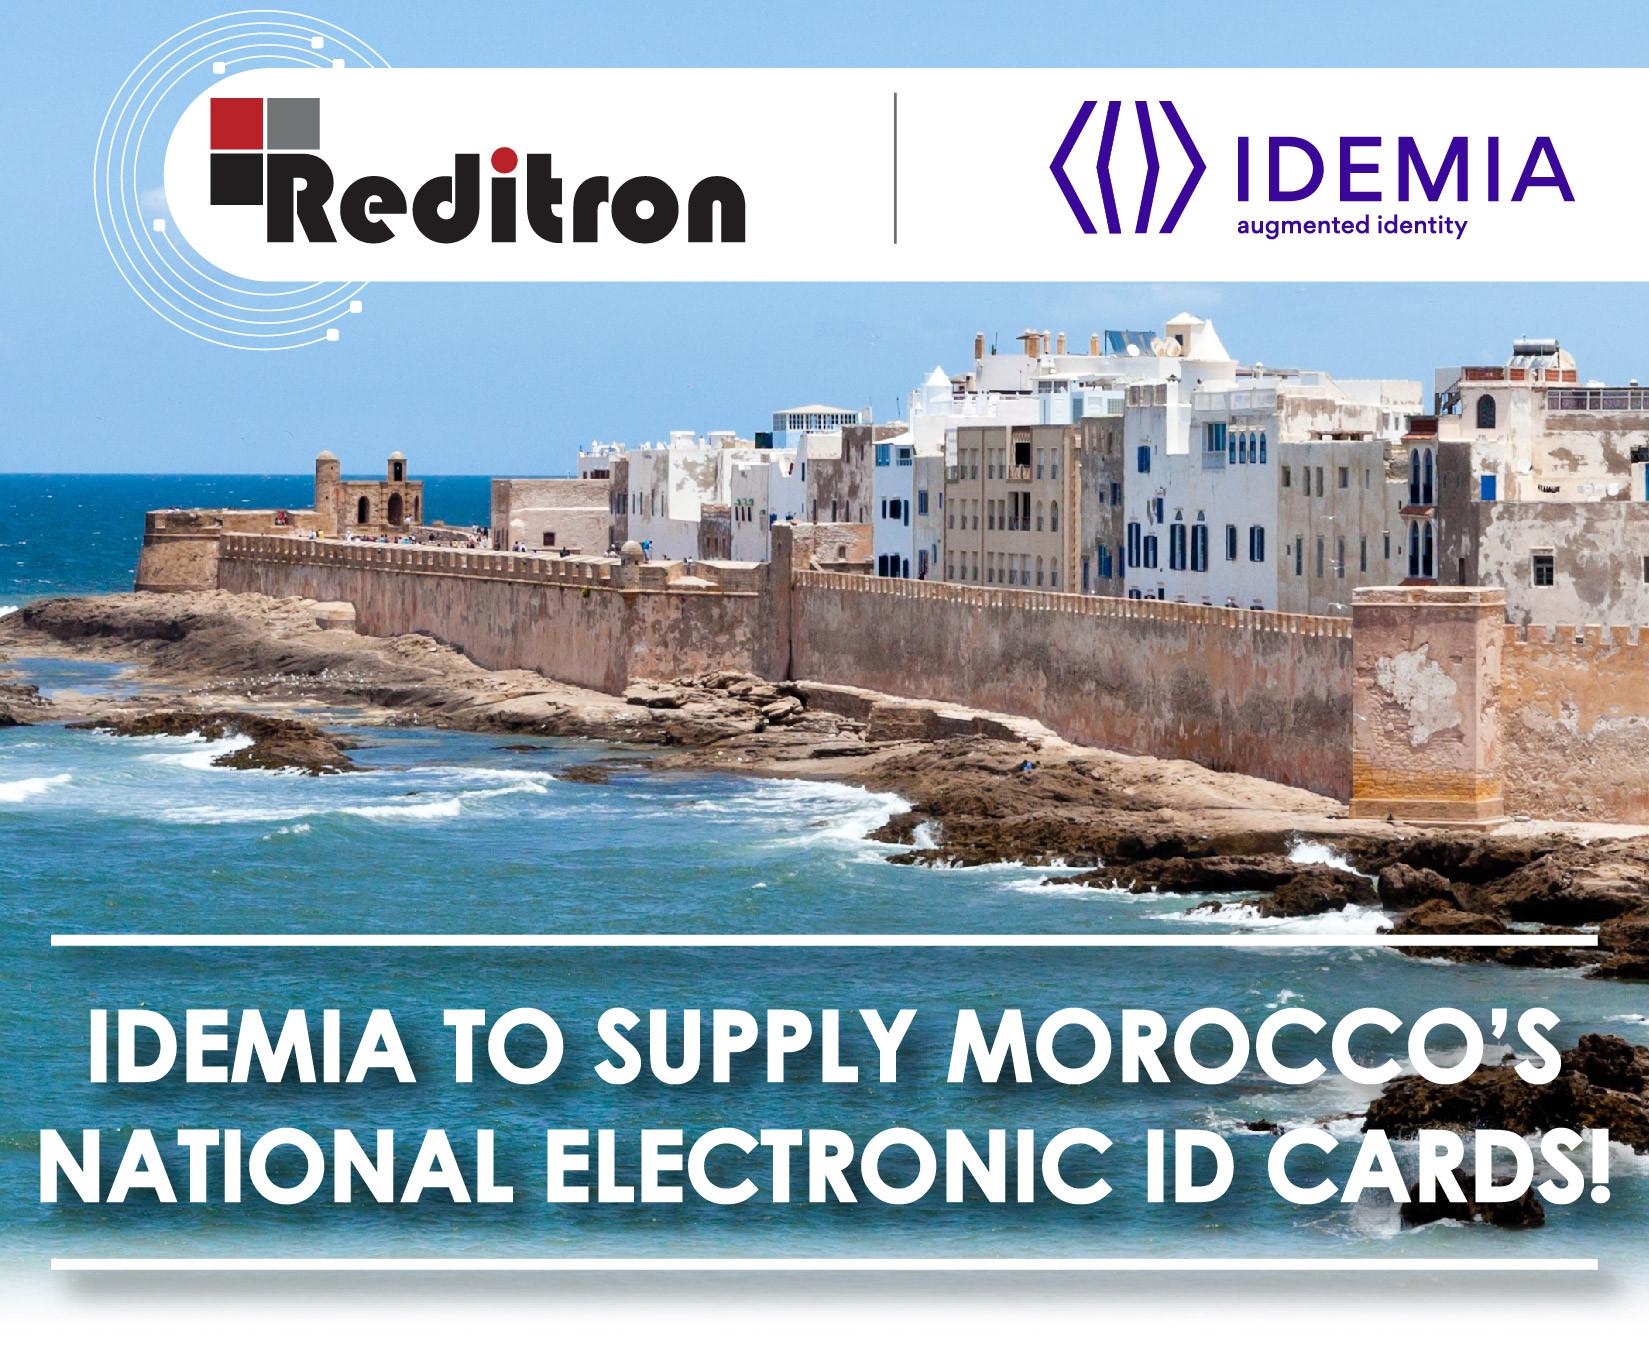 Idemia_Morocco-01(1).jpg?v=1582105977144